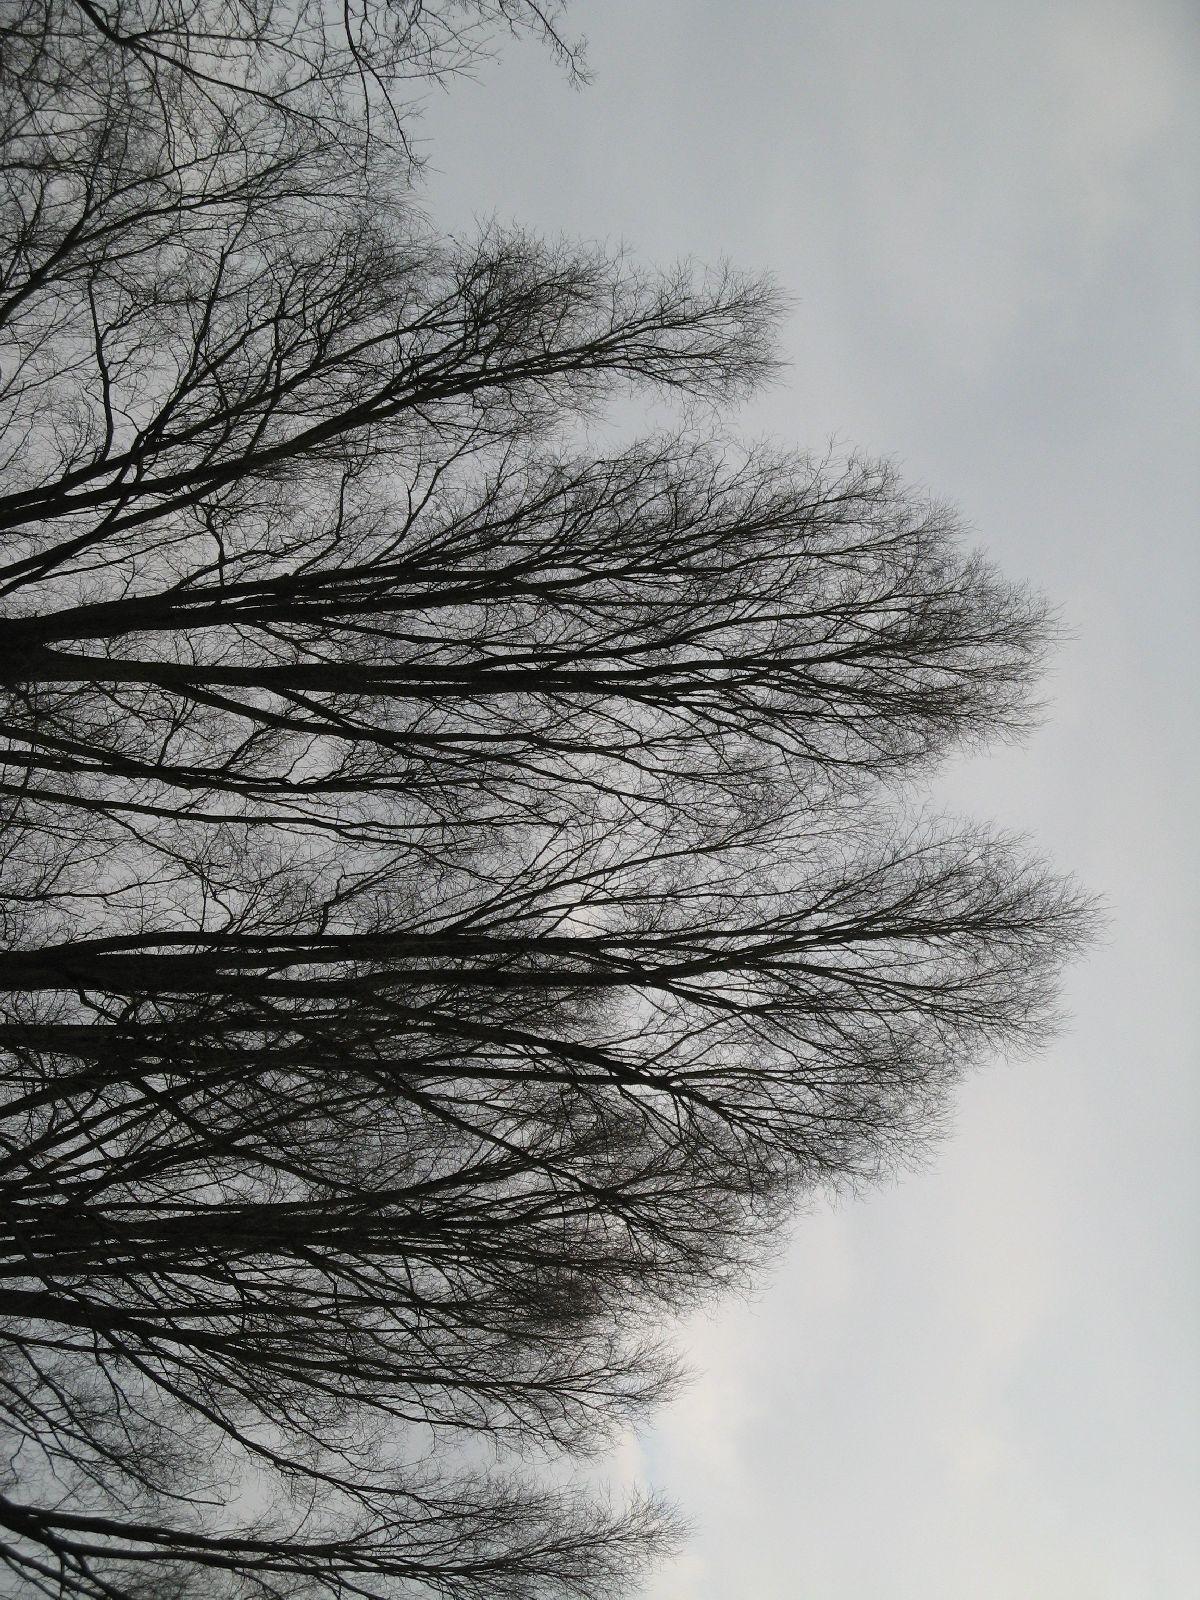 Plants-Trees_Photo_Texture_B_43140